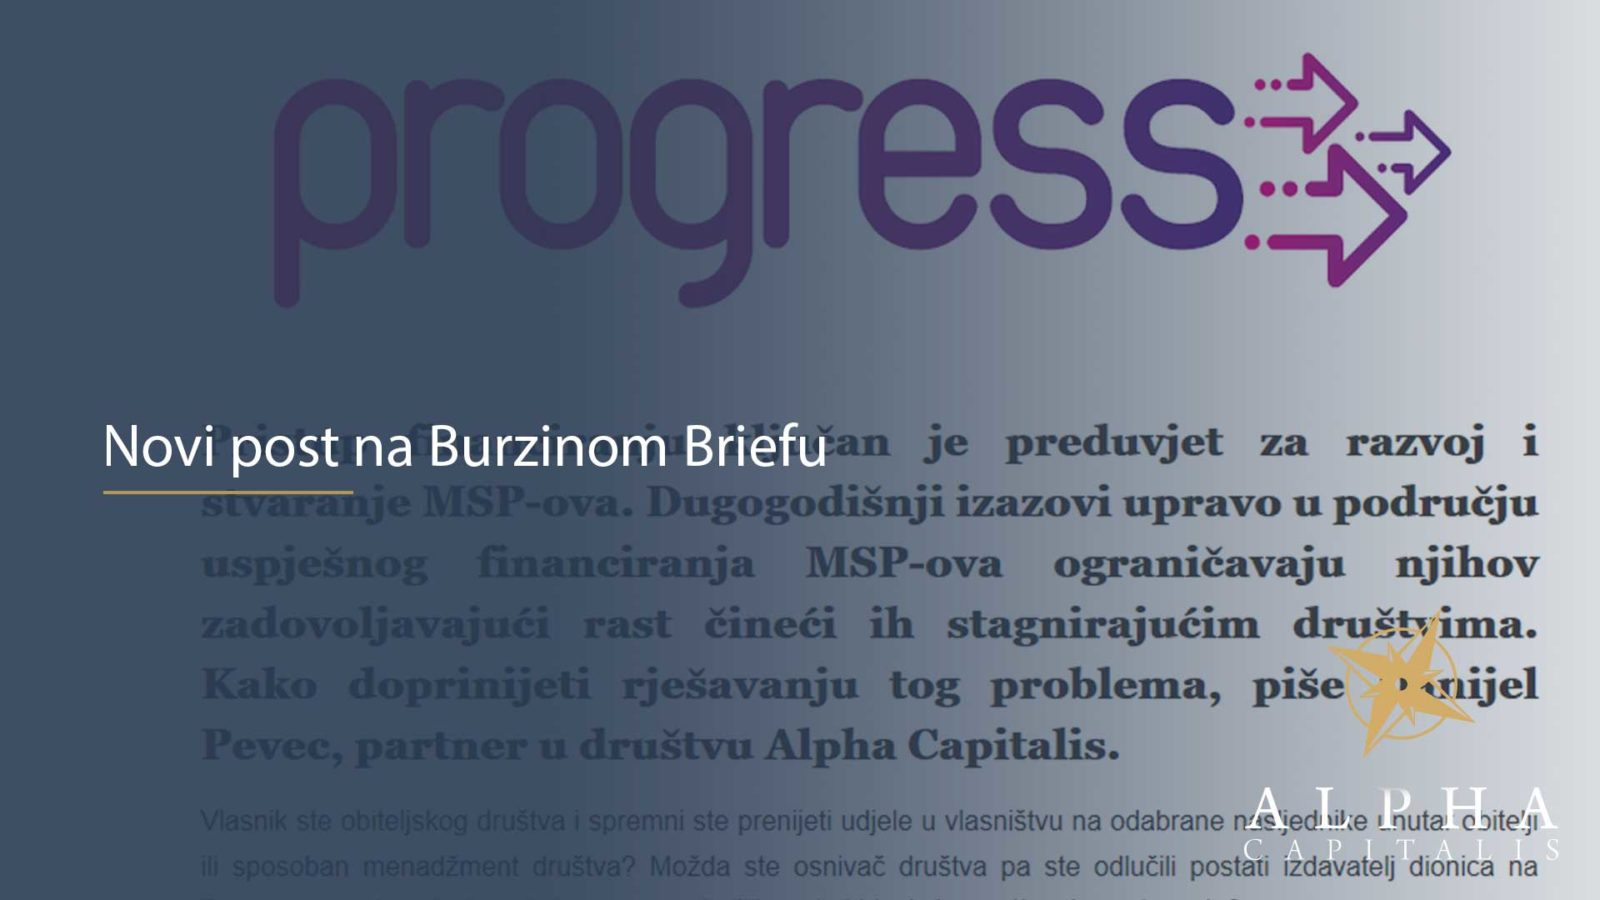 zseblog 03 - Novi post na Burzinom Briefu